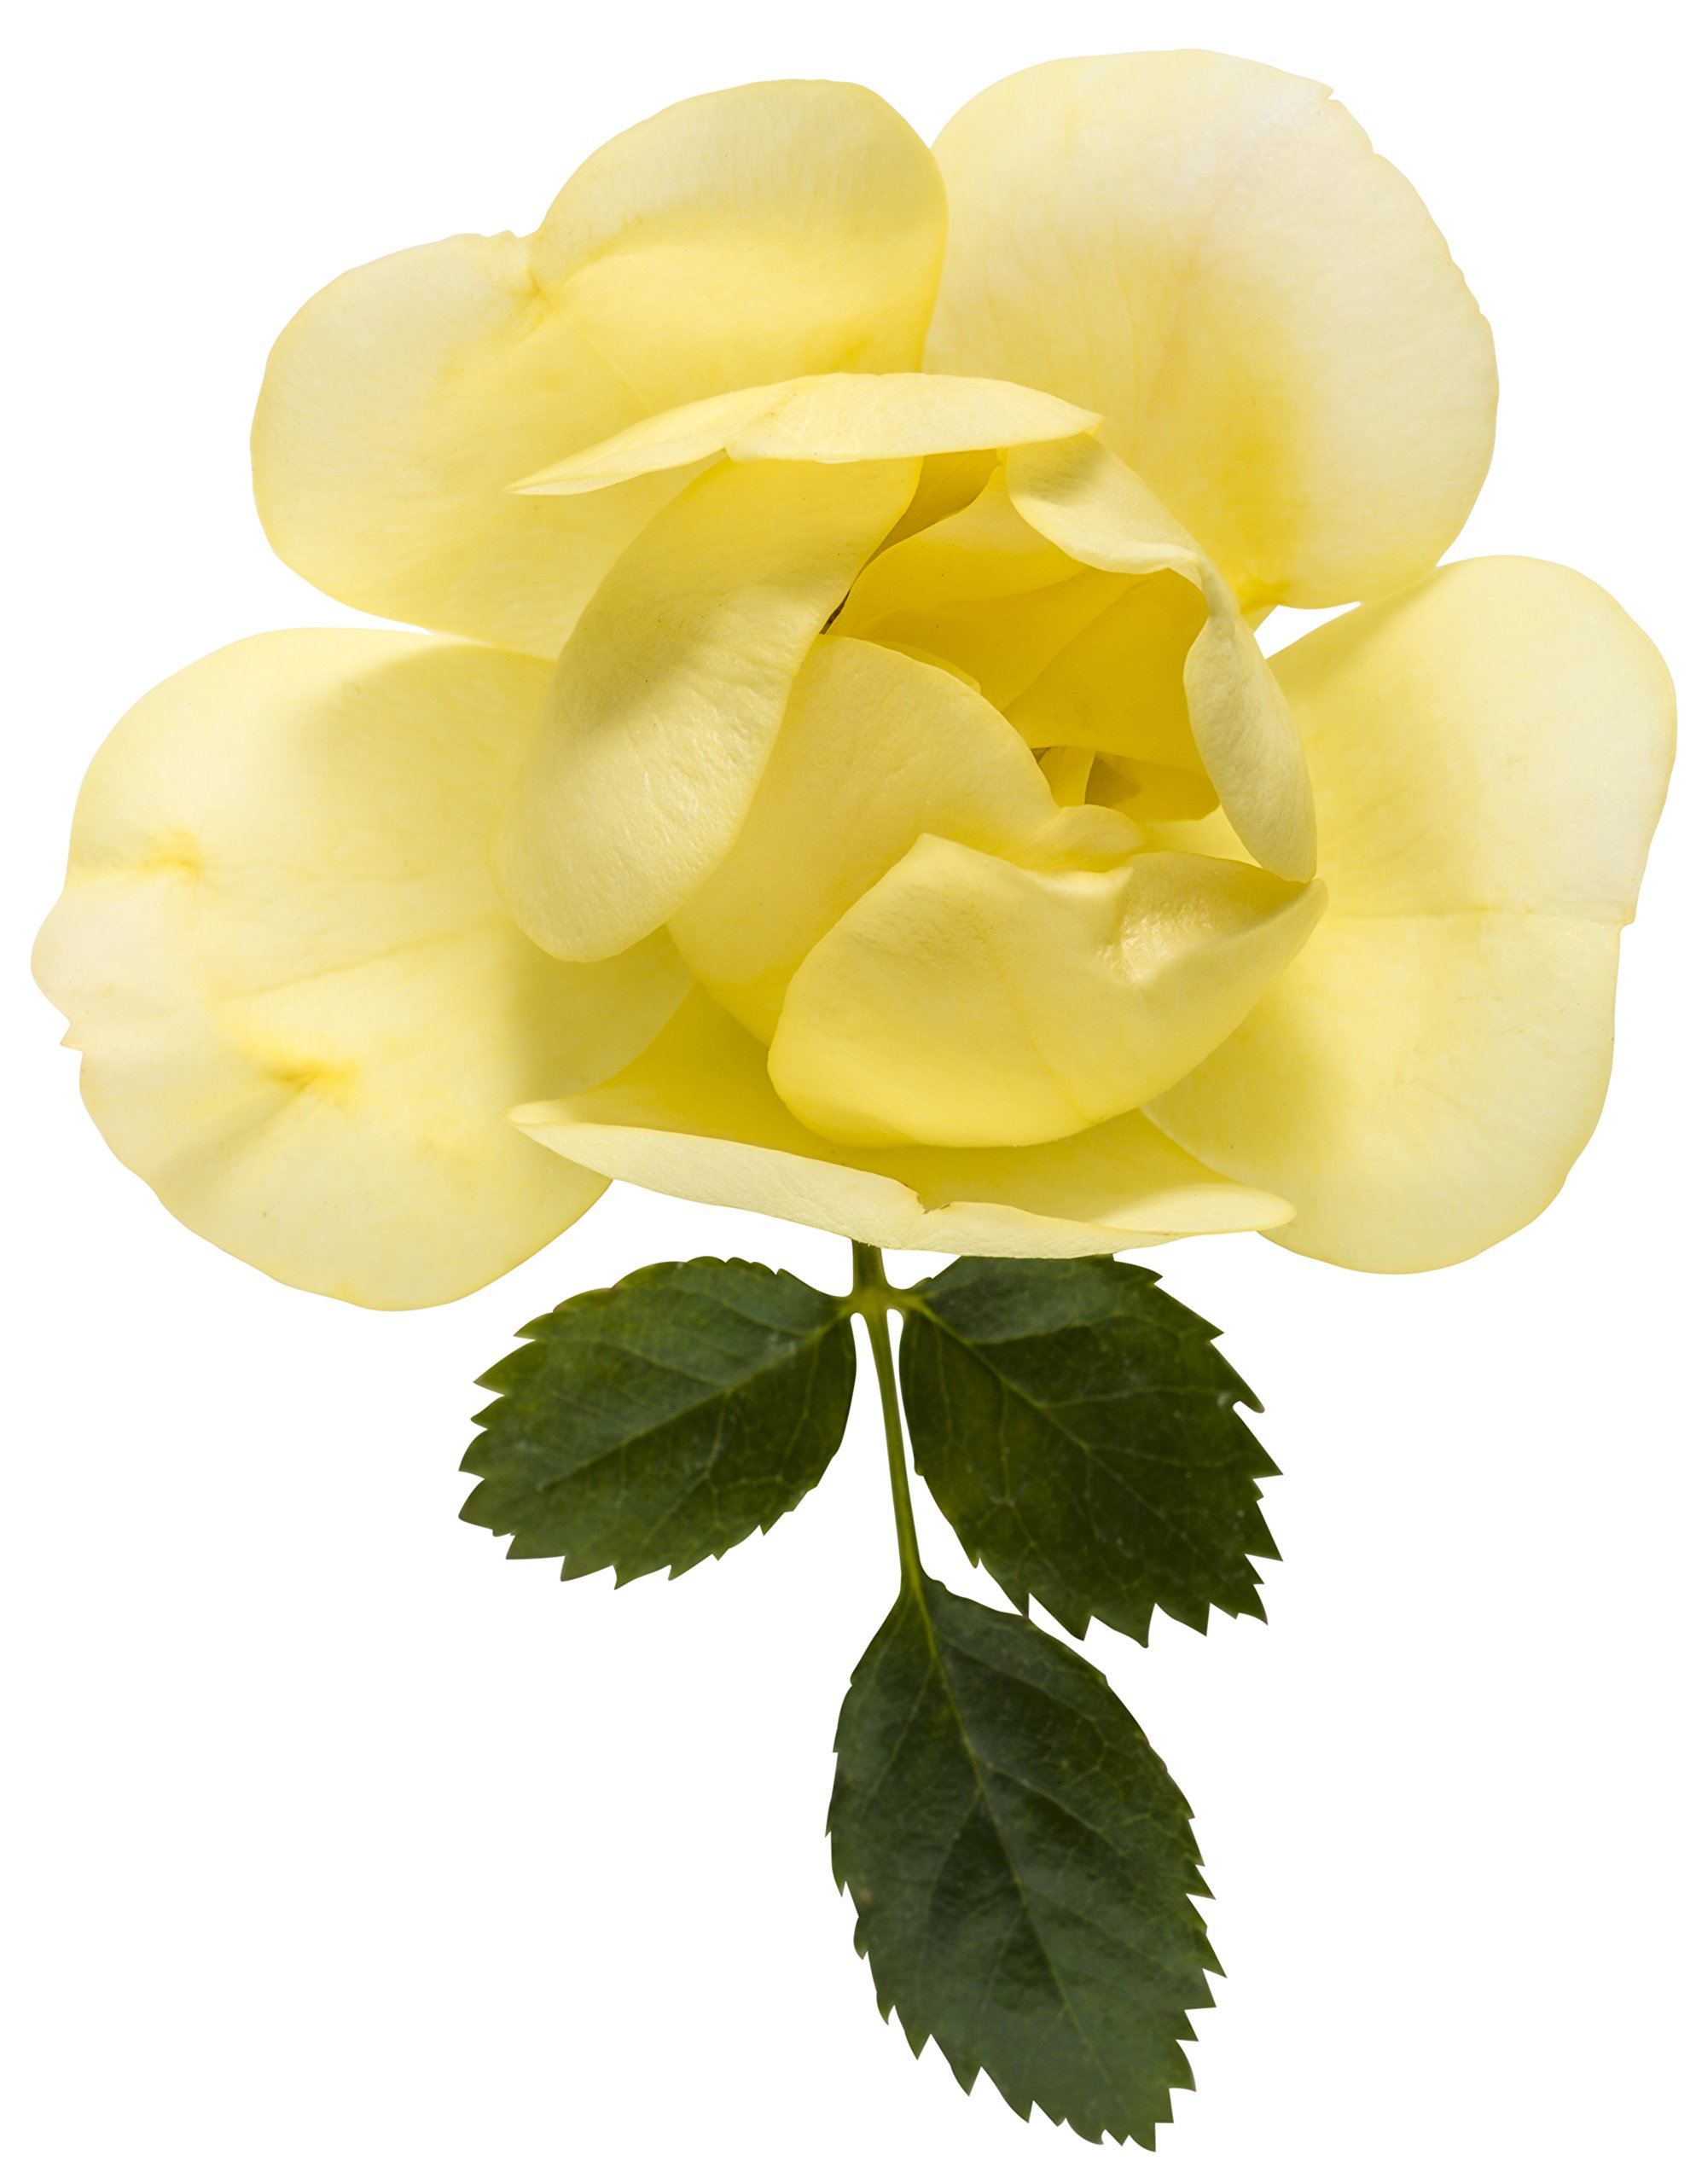 3 Gal. Oso Easy Lemon Zest Landscape Rose (Rosa) Live Shrub, Yellow Flowers by Proven Winners (Image #5)